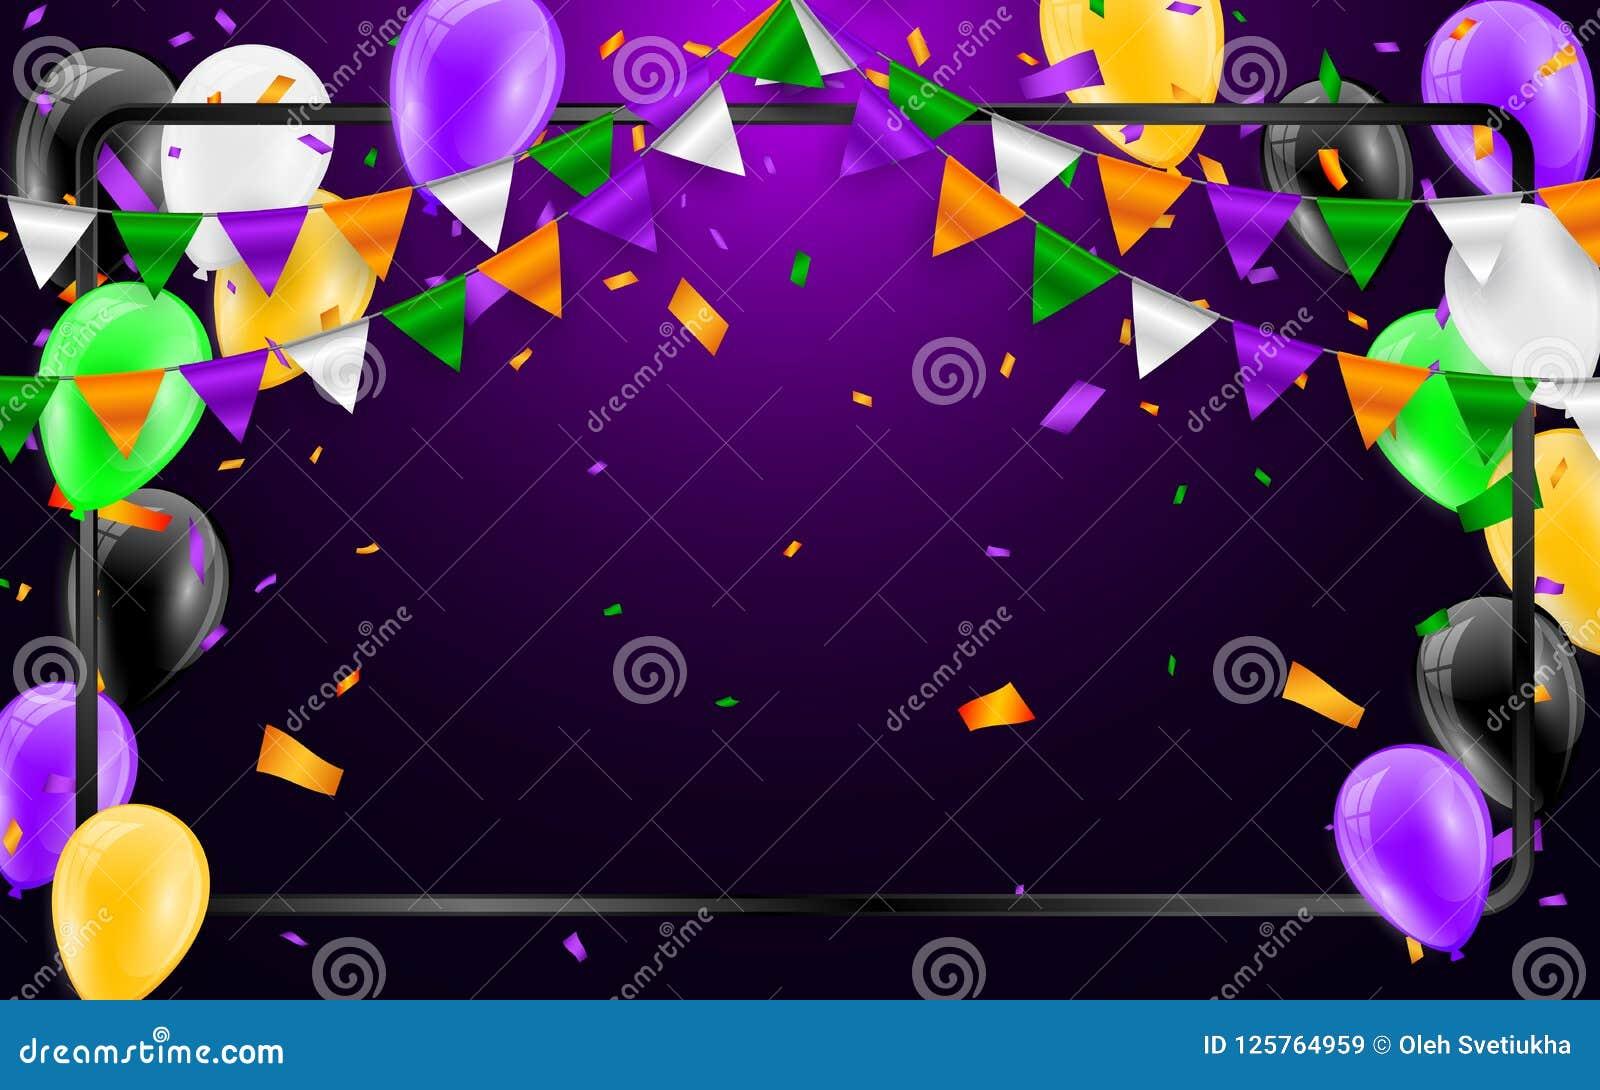 happy halloween carnival background. orange purple flags garland